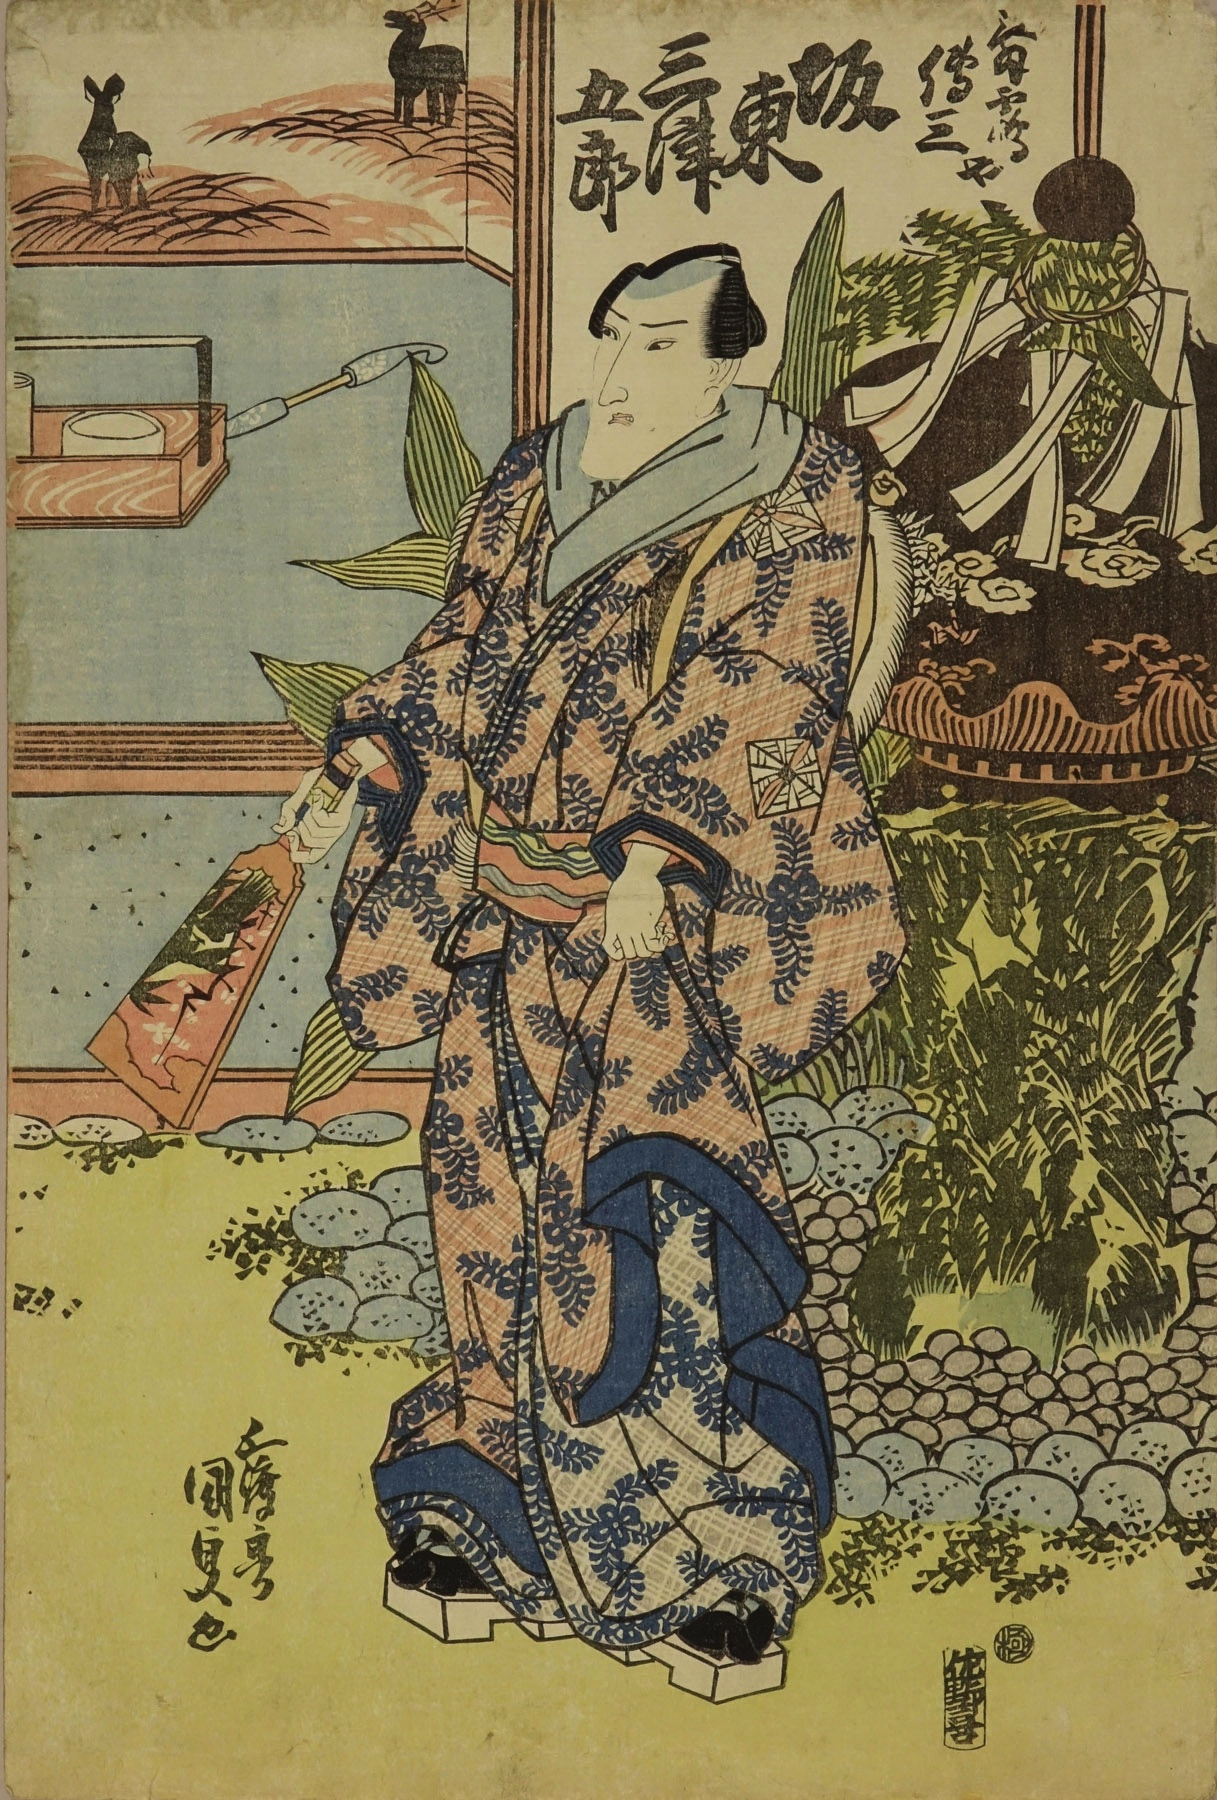 KUNISADA Portrait of the actor Bando Mitsugoro in the role of Maitsuruya Denzo